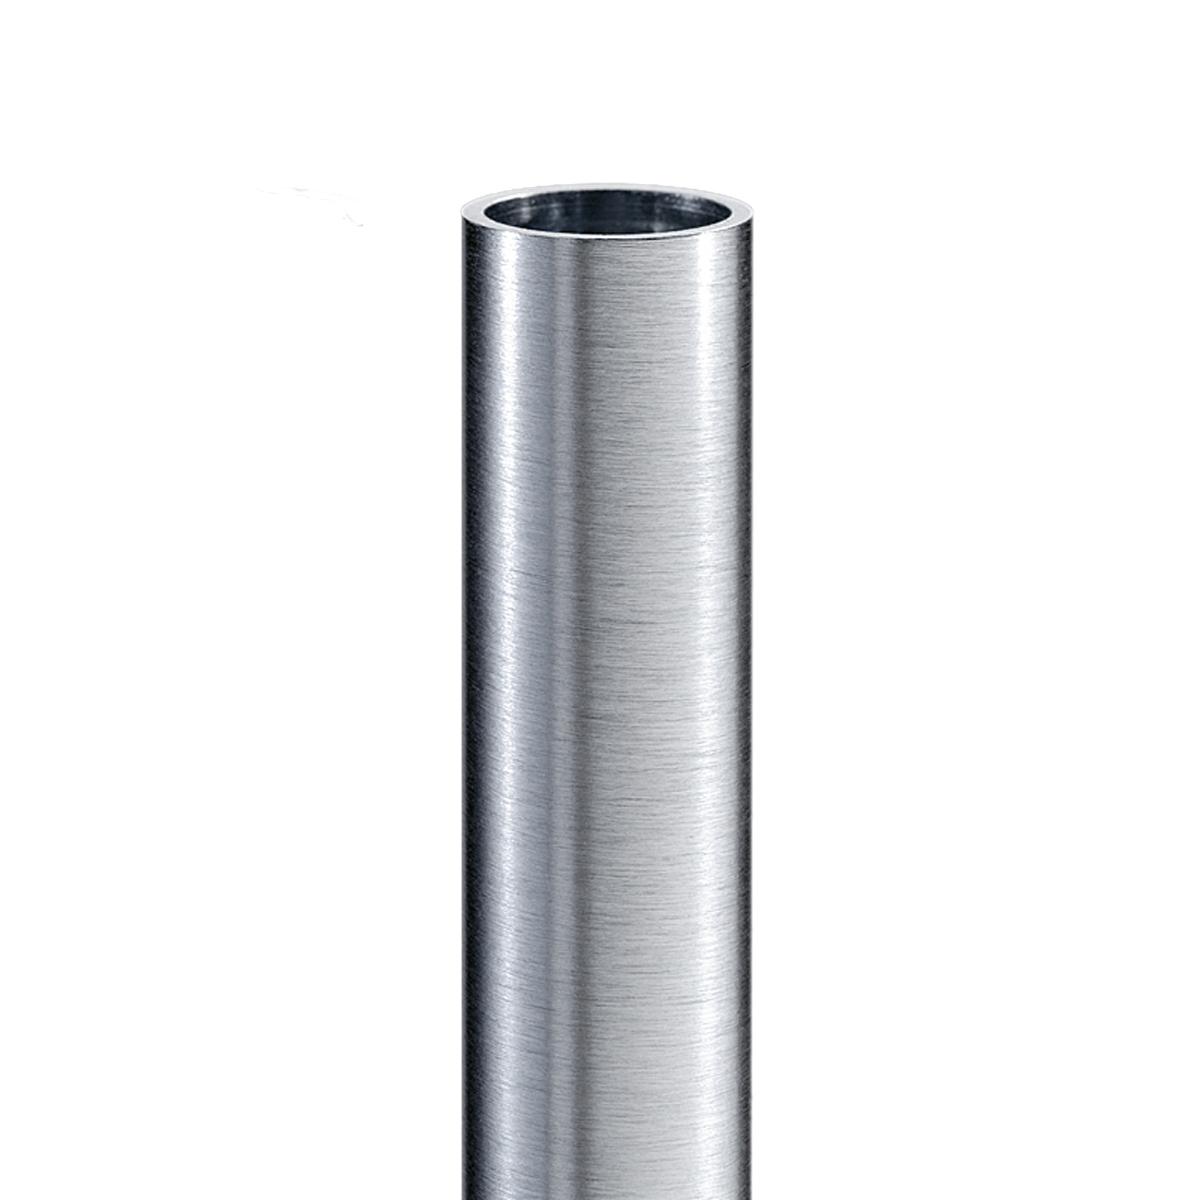 Knapstein Bela LED Deckenfluter 41.942.05